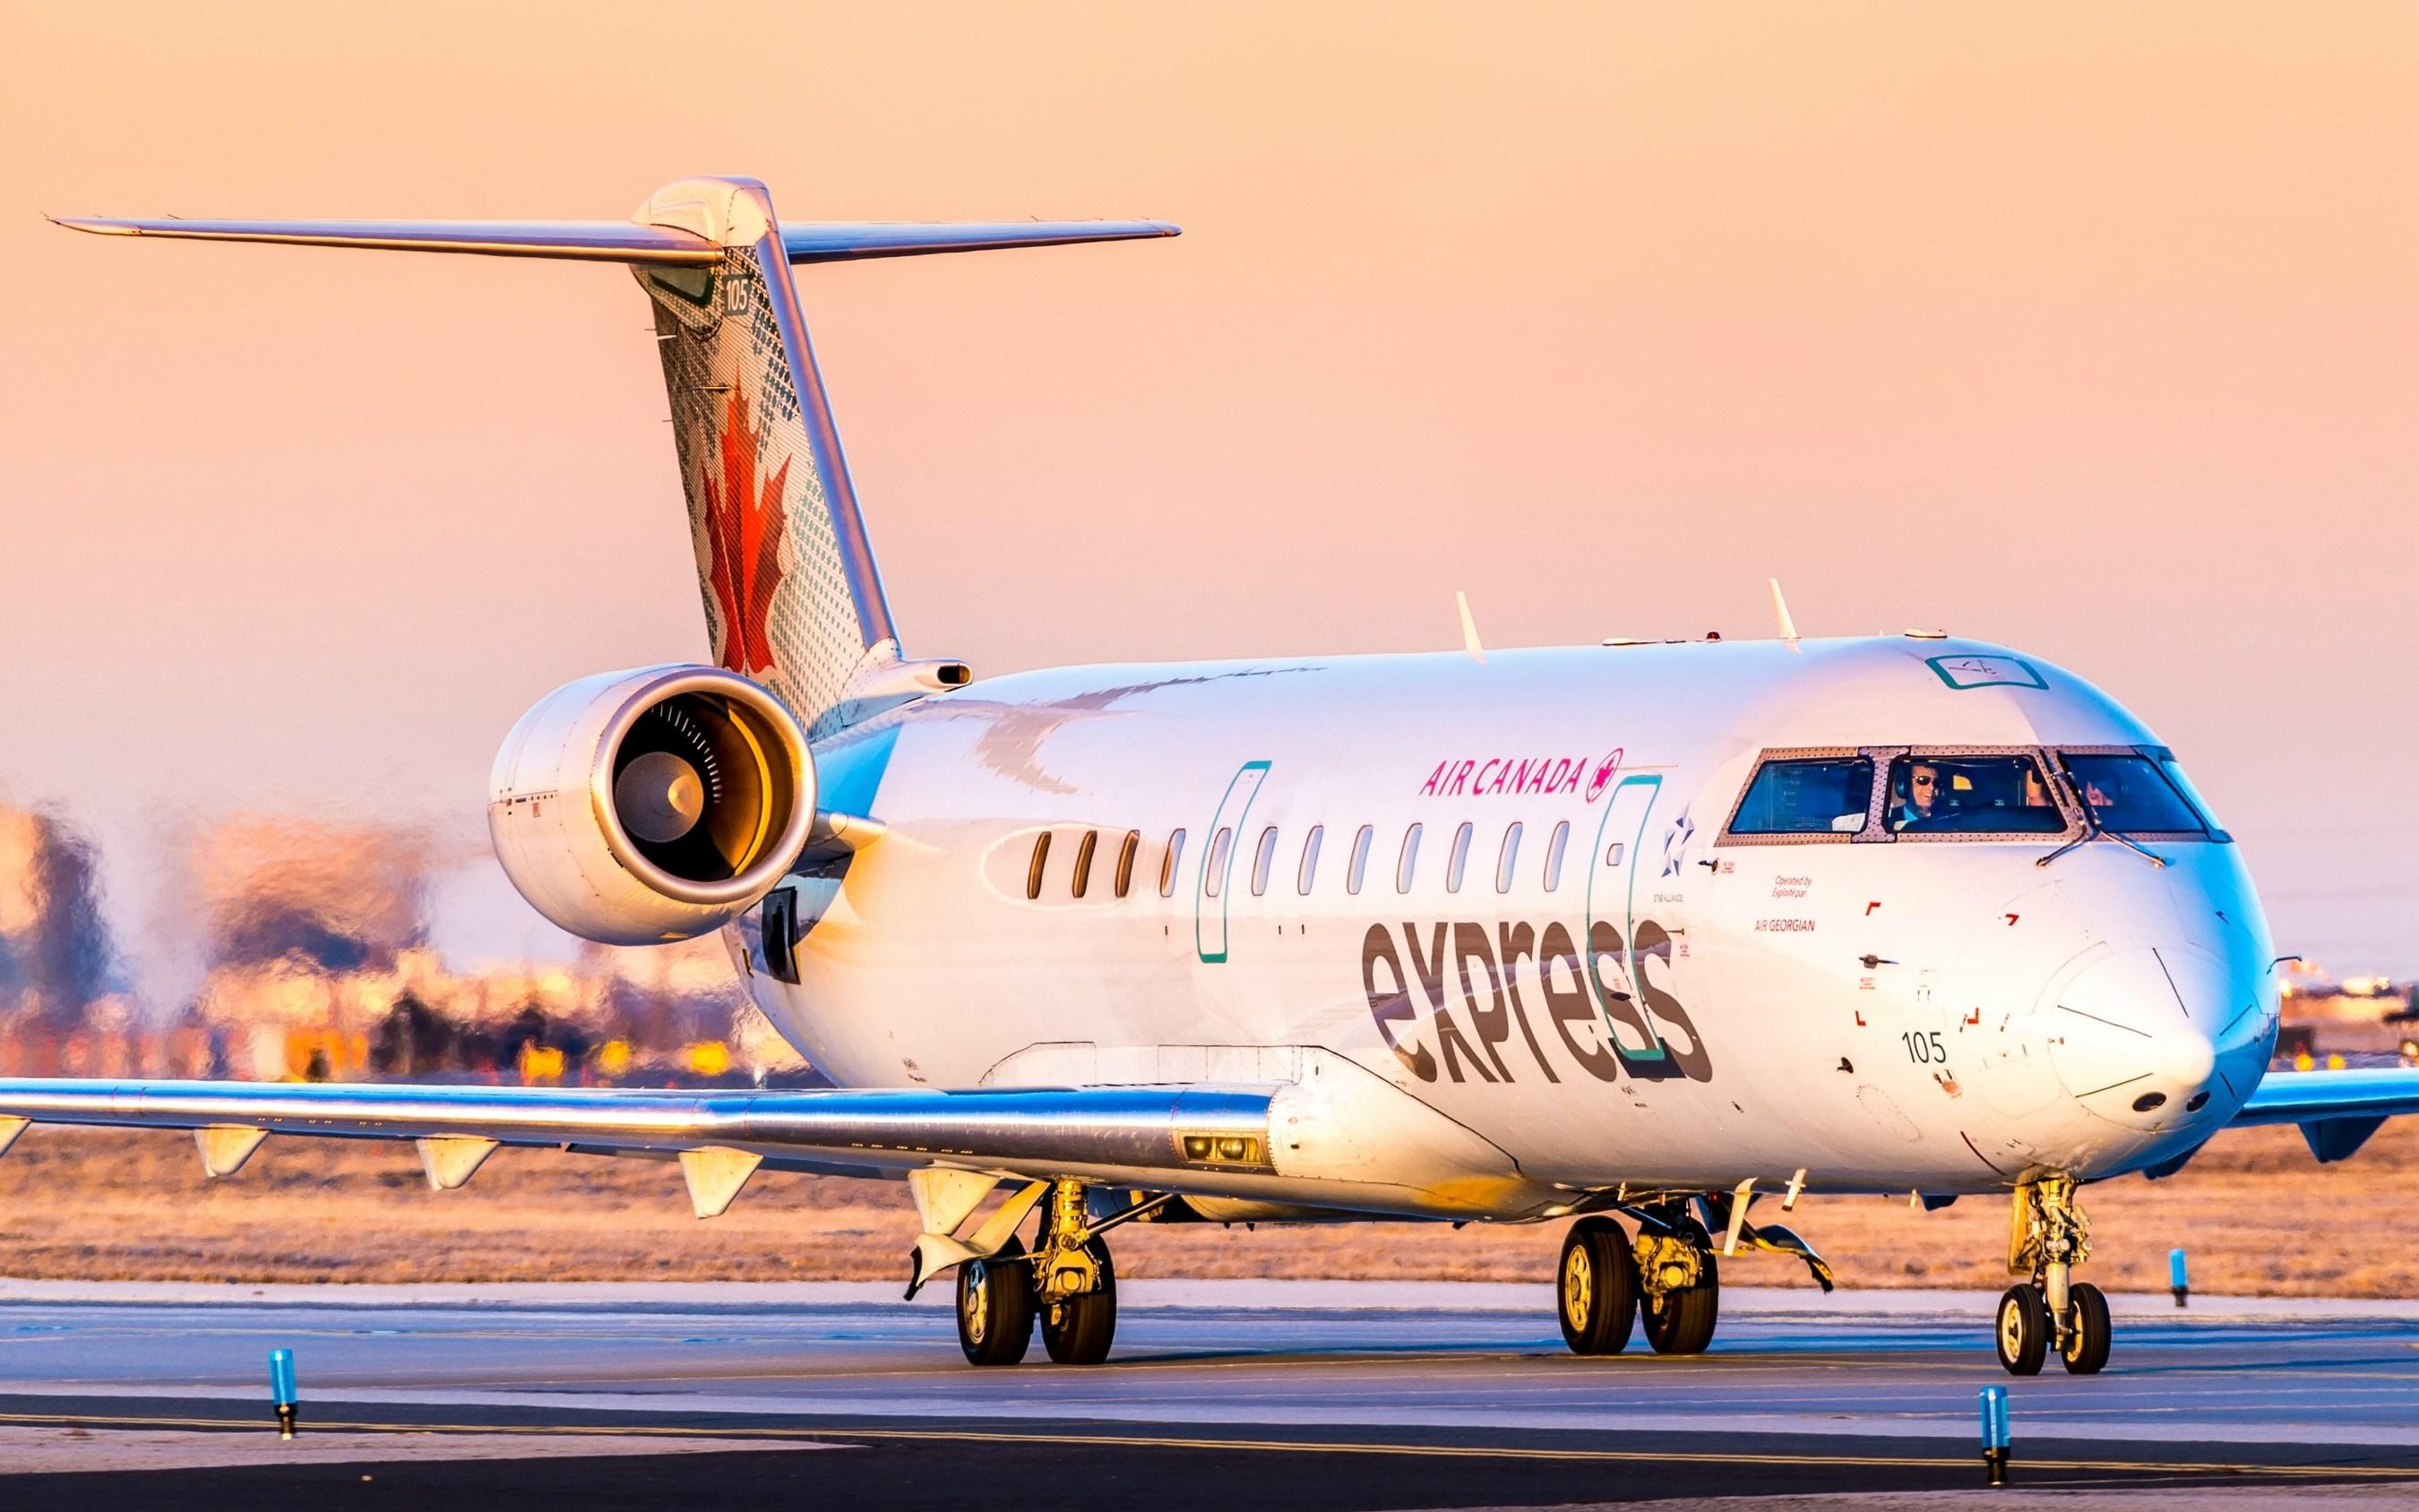 Bombardier CRJ aircraft on tarmac